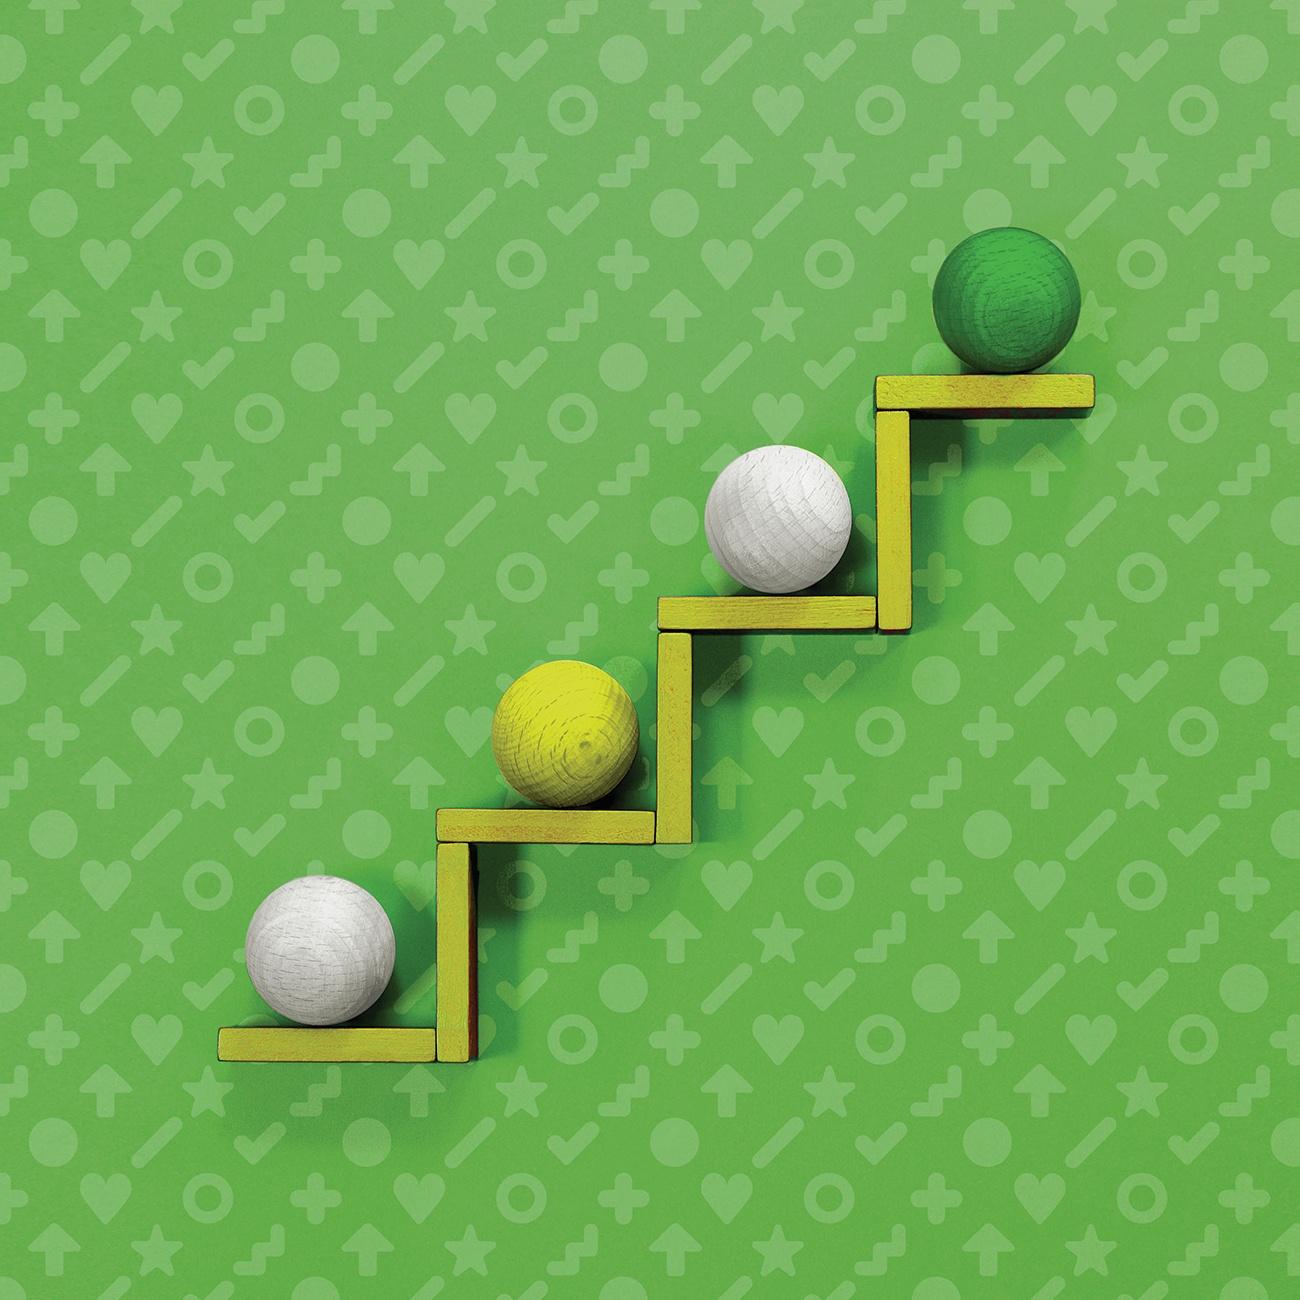 Four wooden balls on a rising platform, set against a patterned background.